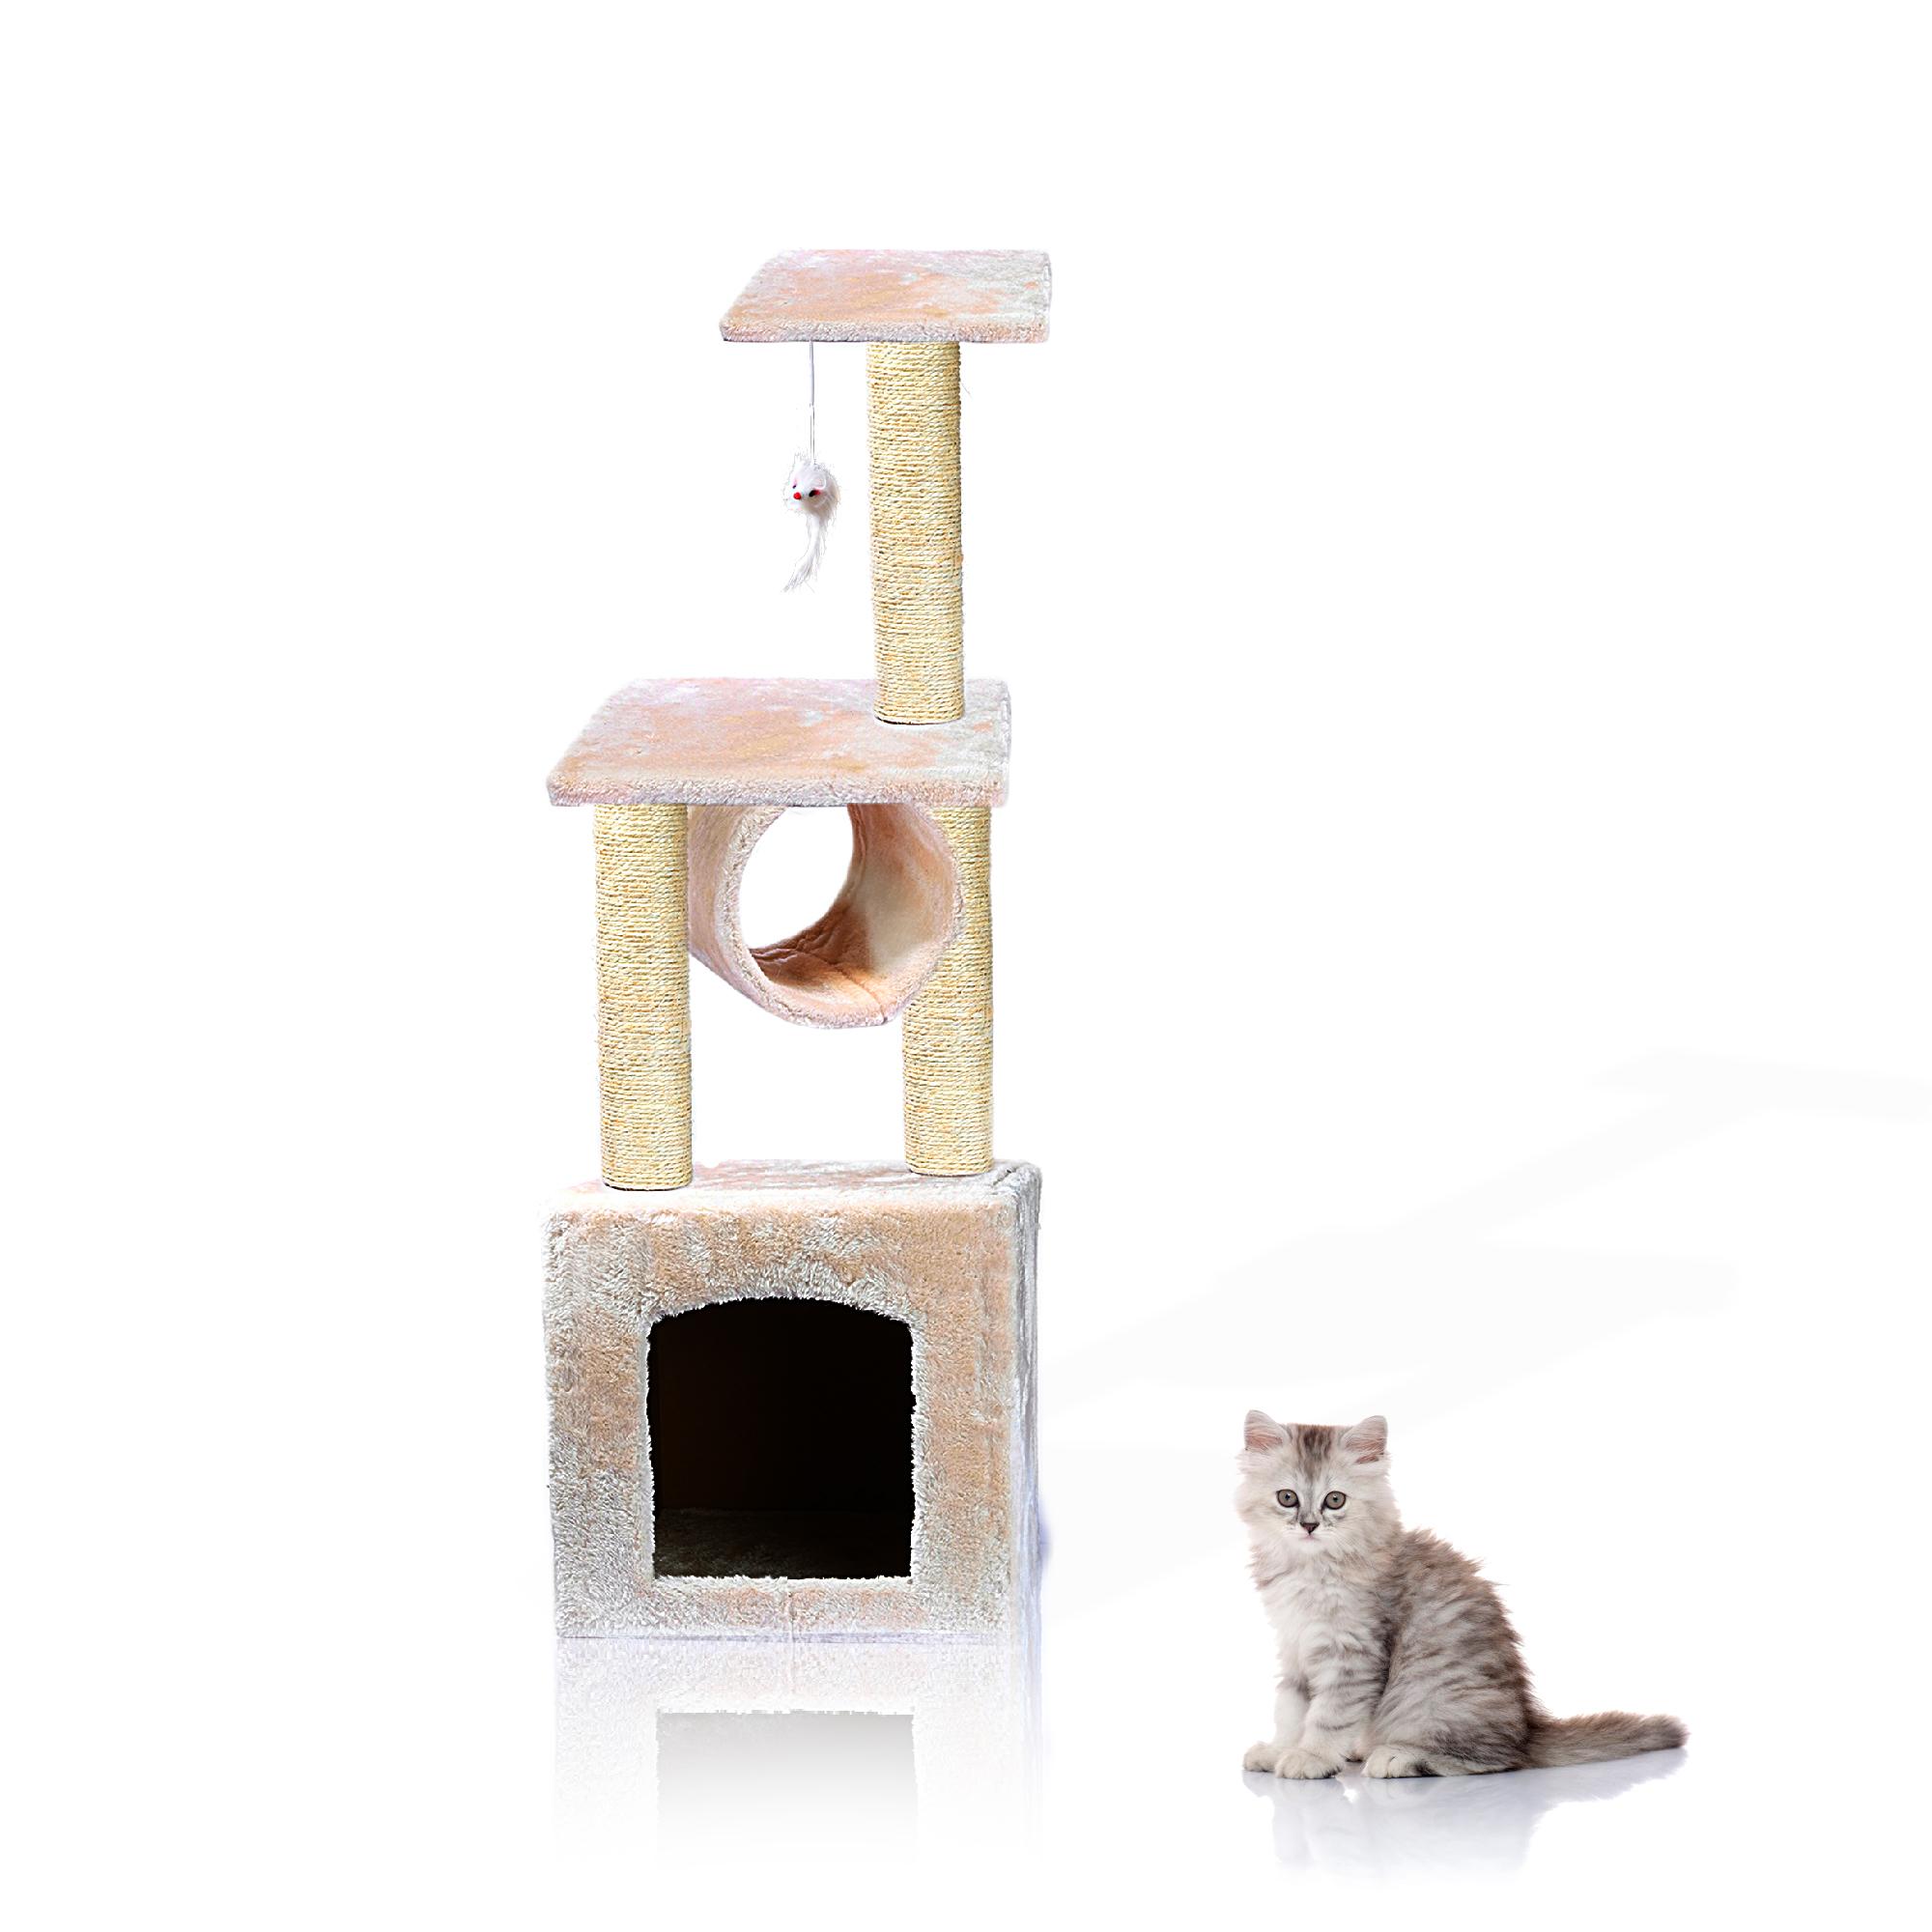 MAIN ISOLATED + cat.jpg